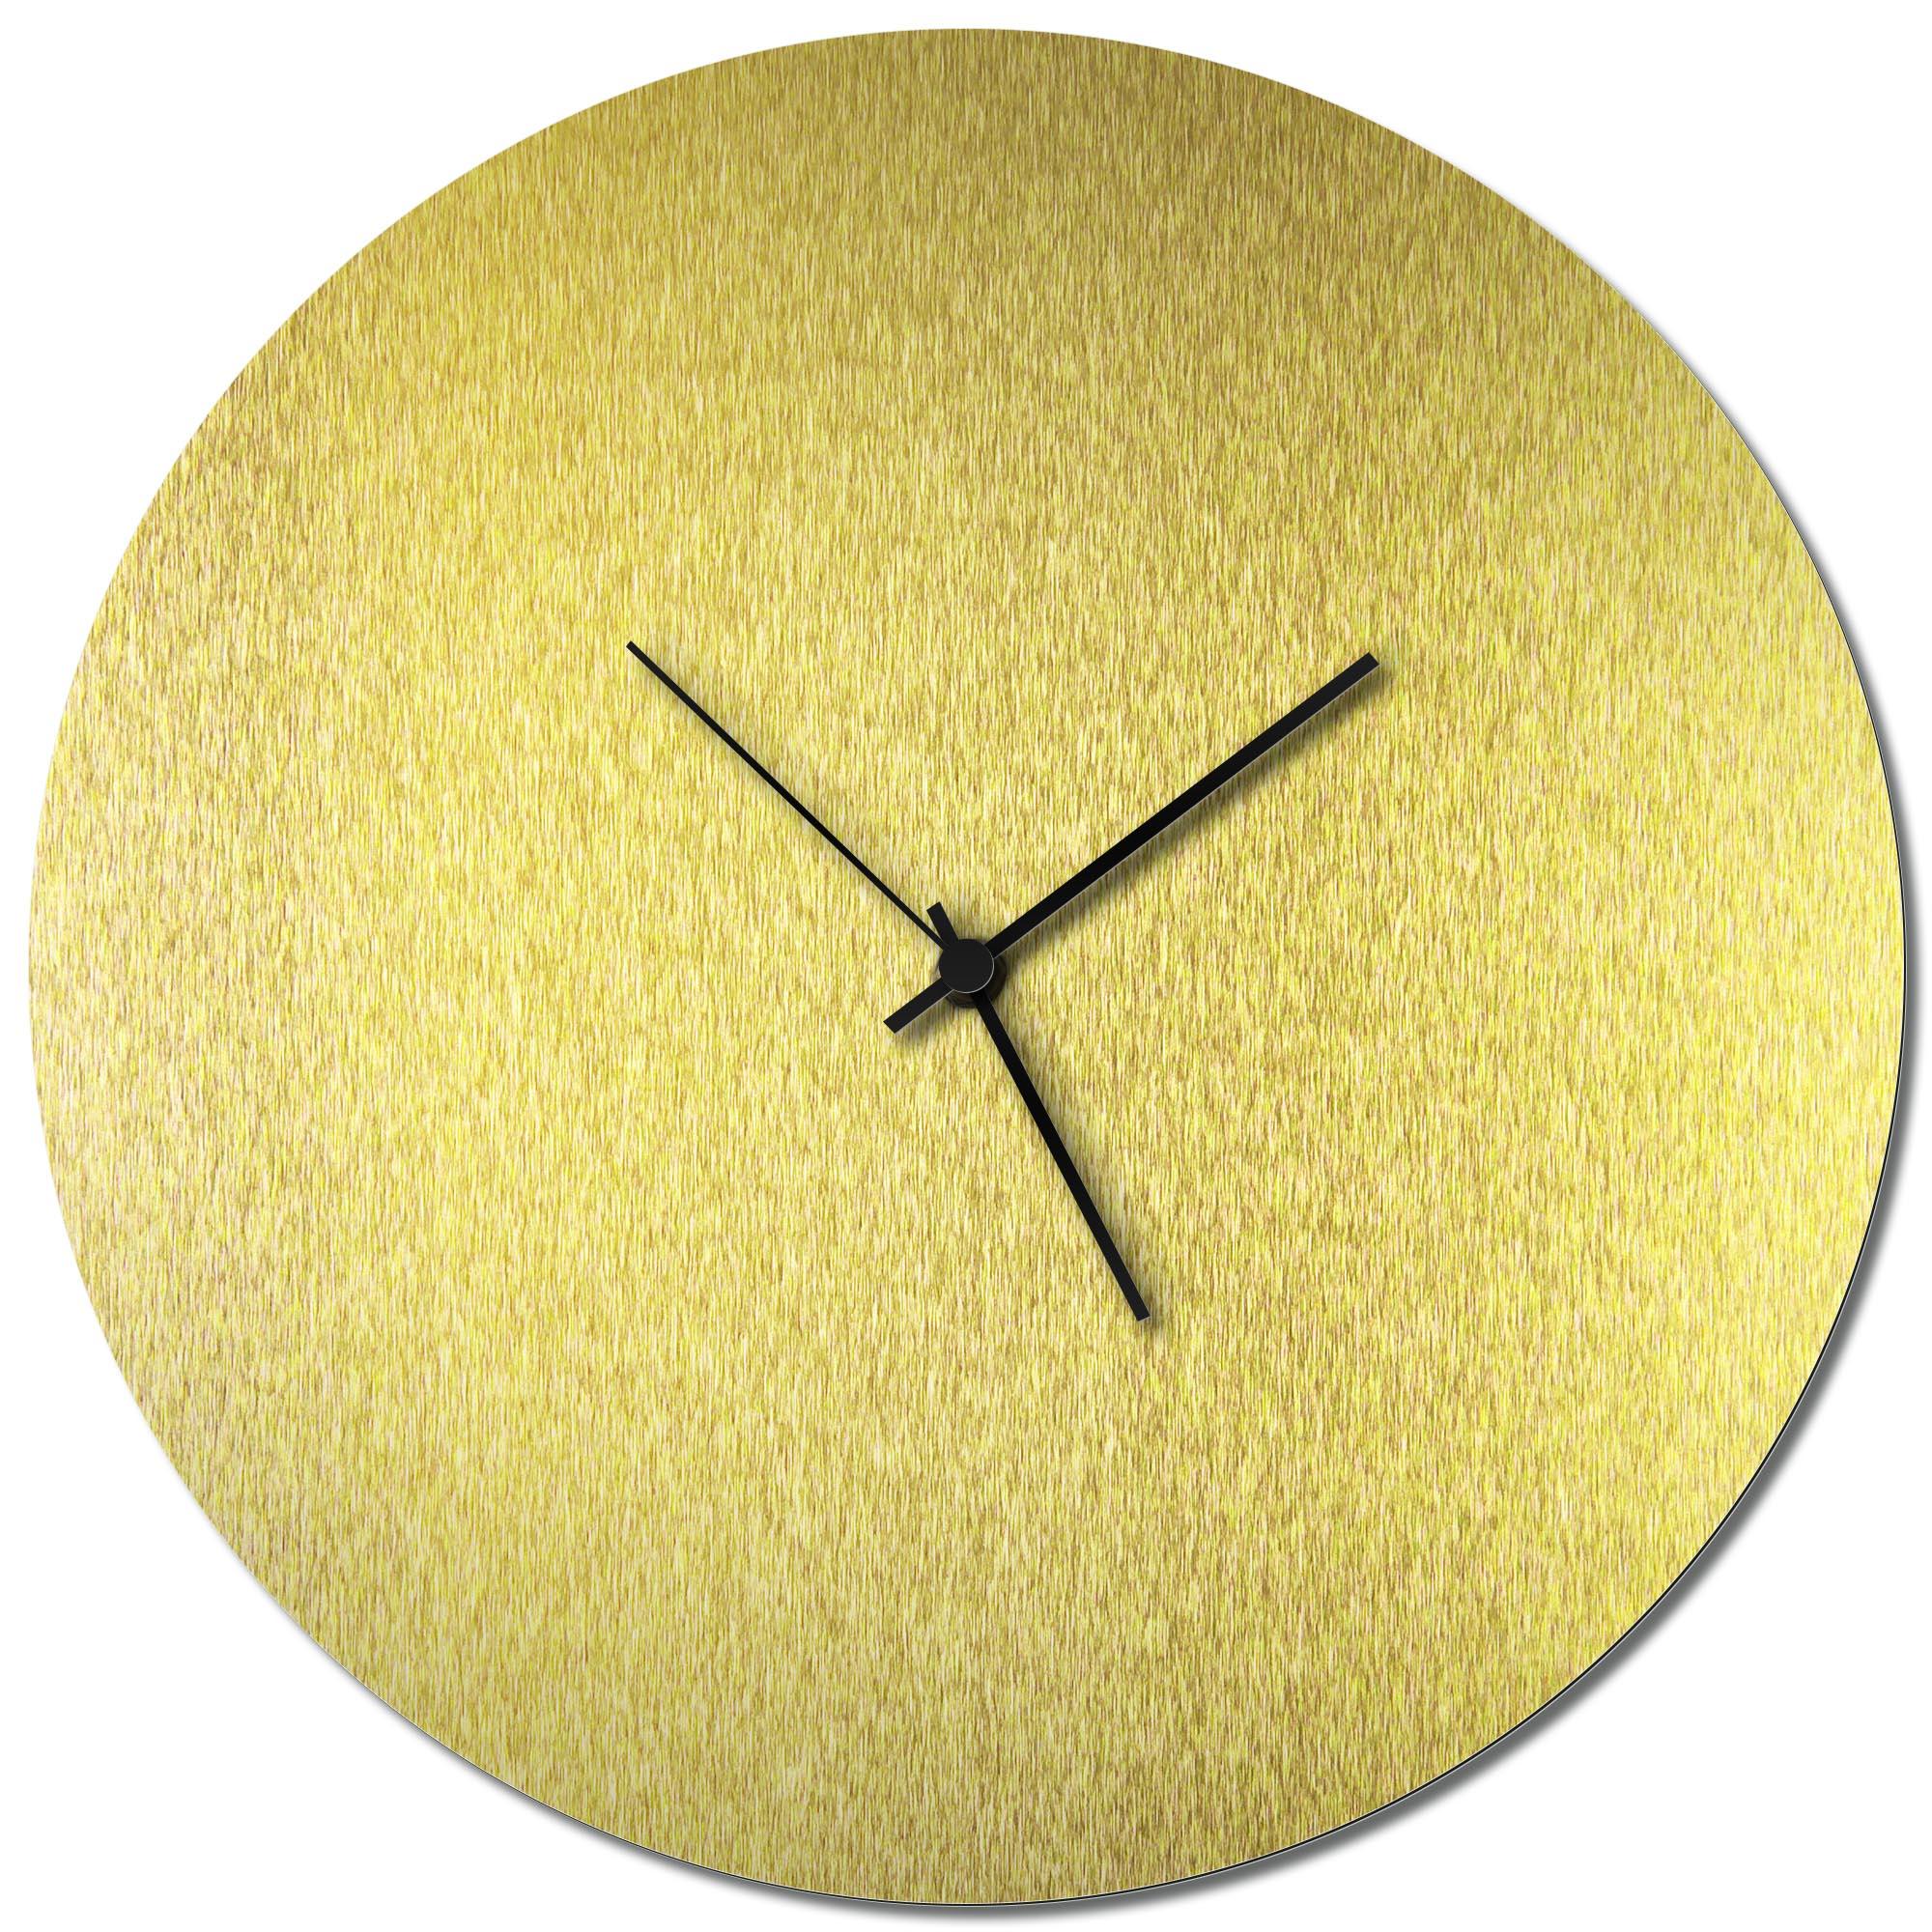 Adam Schwoeppe 'Goldsmith Circle Clock Black' Midcentury Modern Style Wall Clock